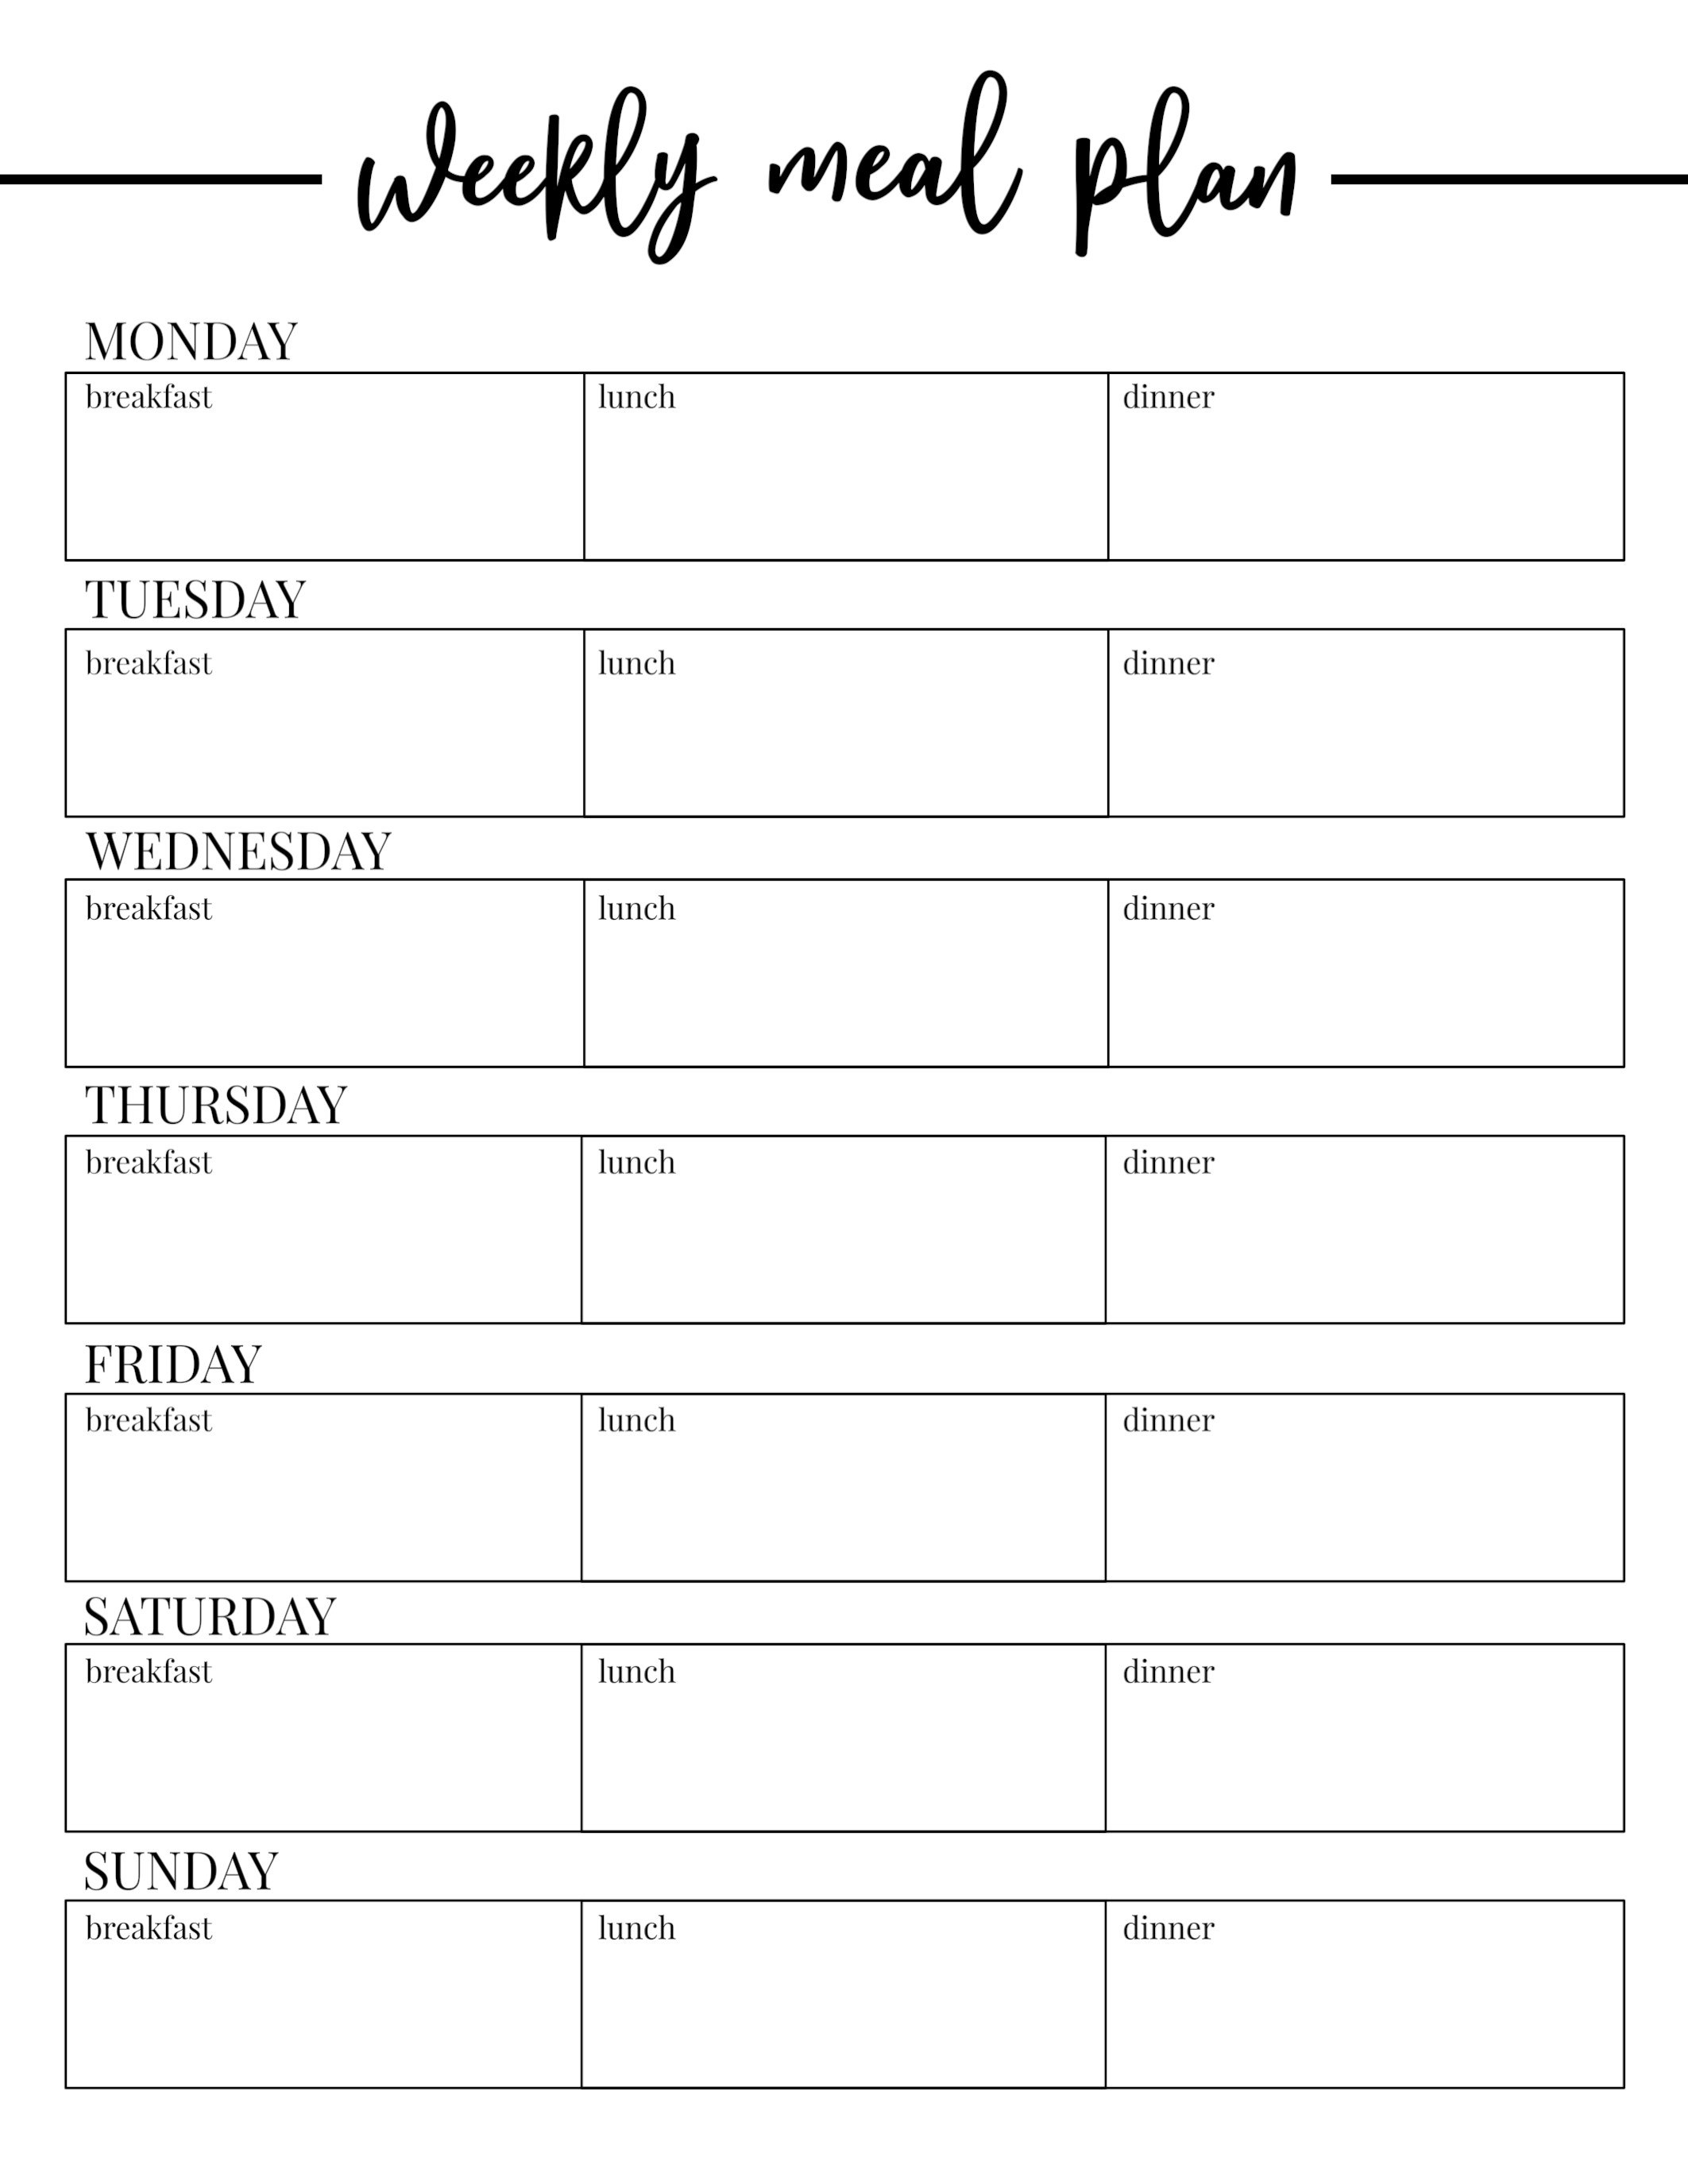 Plans Weekly Meal Free Planning Singular Template Plan Templates Regarding Weekly Menu Template Word